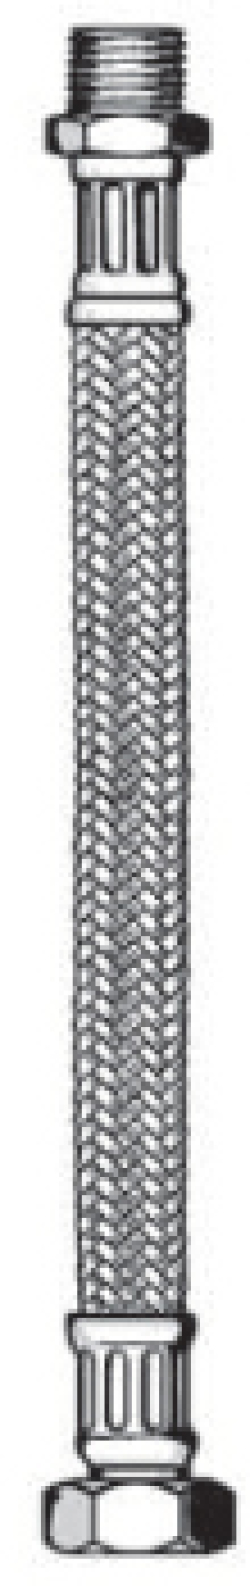 МЕ 5625.1127.40 Meiflex Dn18, 3/4 BPx3/4HP, 400mm